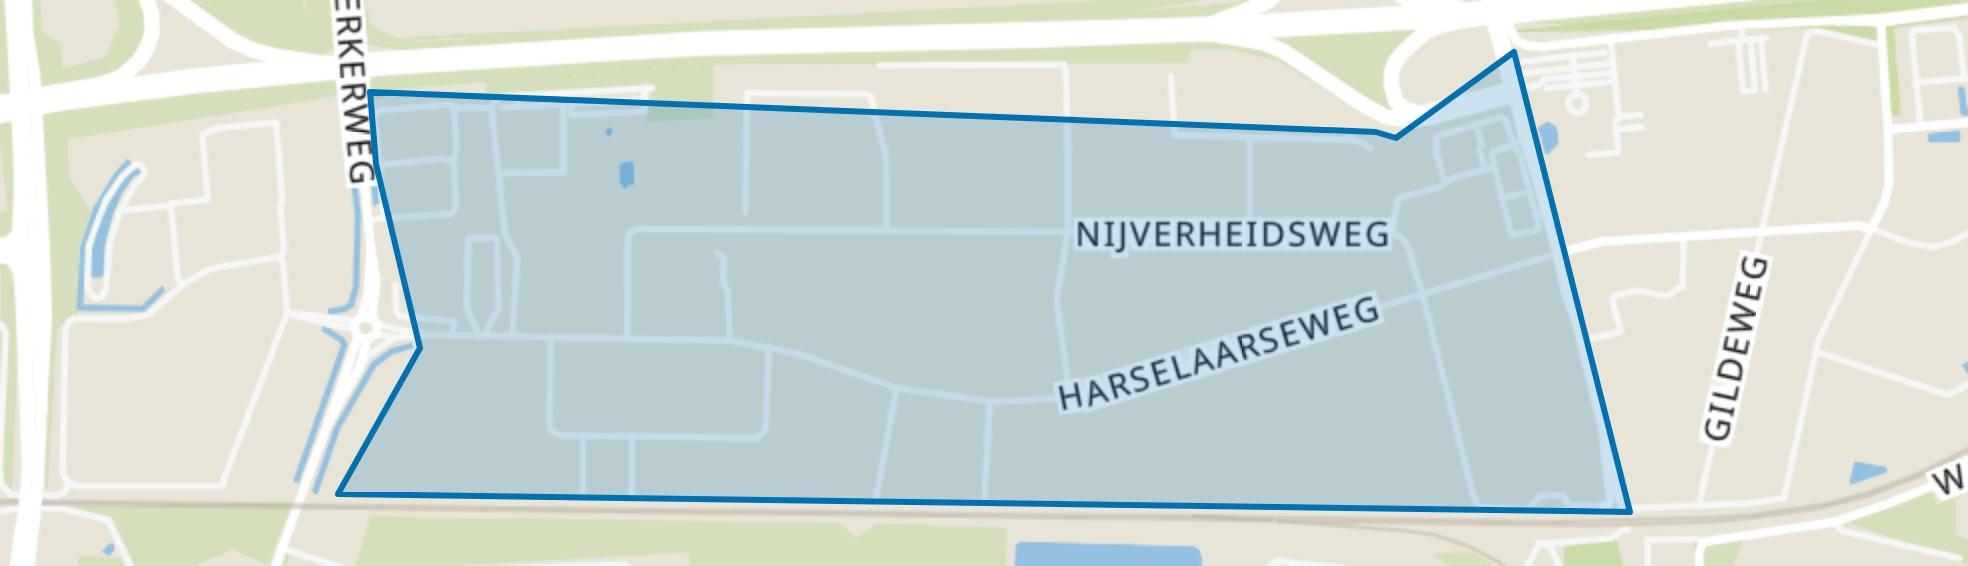 Harselaar-West, Barneveld map